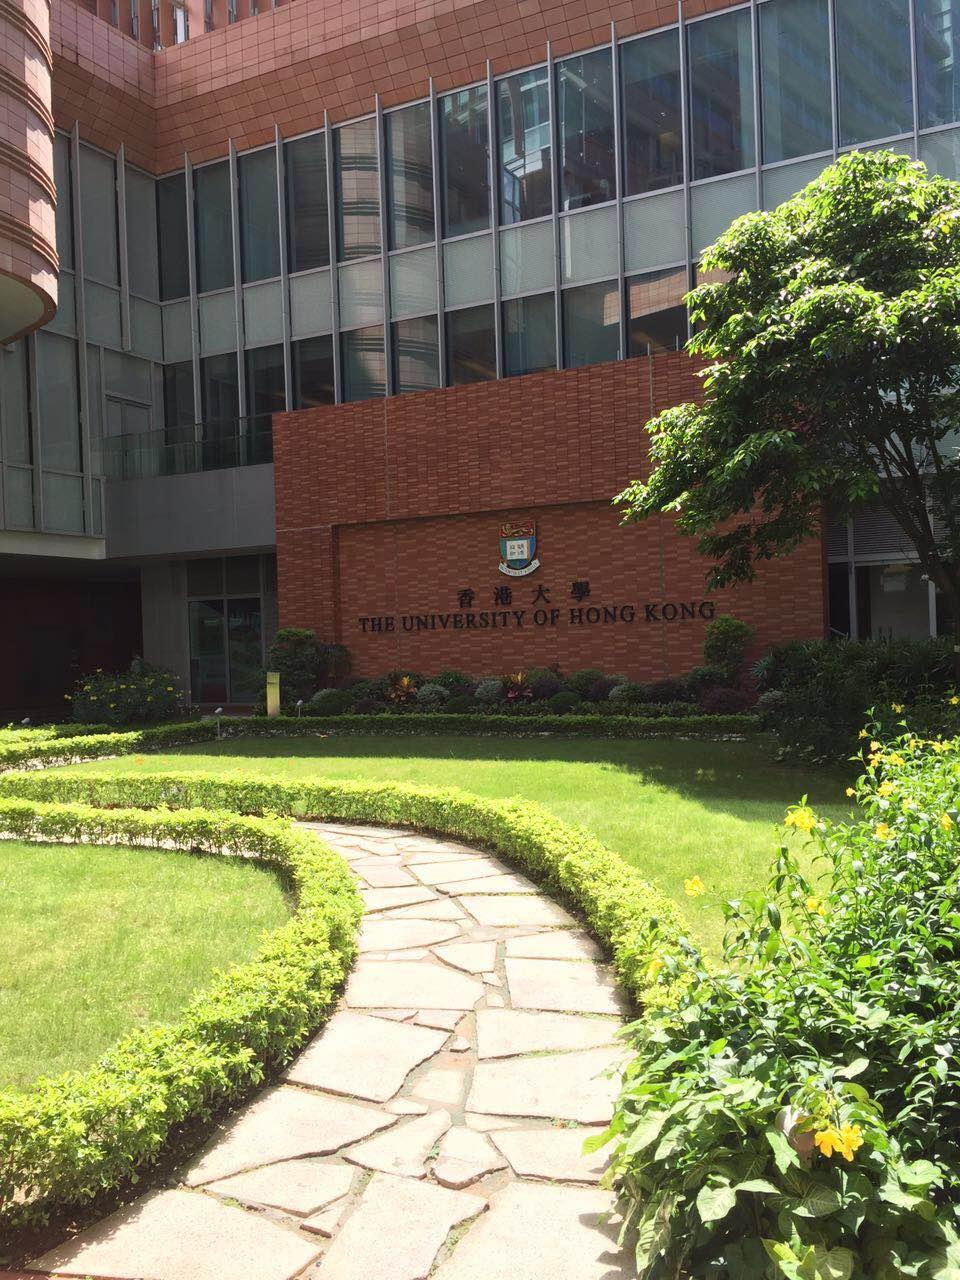 sidewalk and garden in the University of Hong Kong